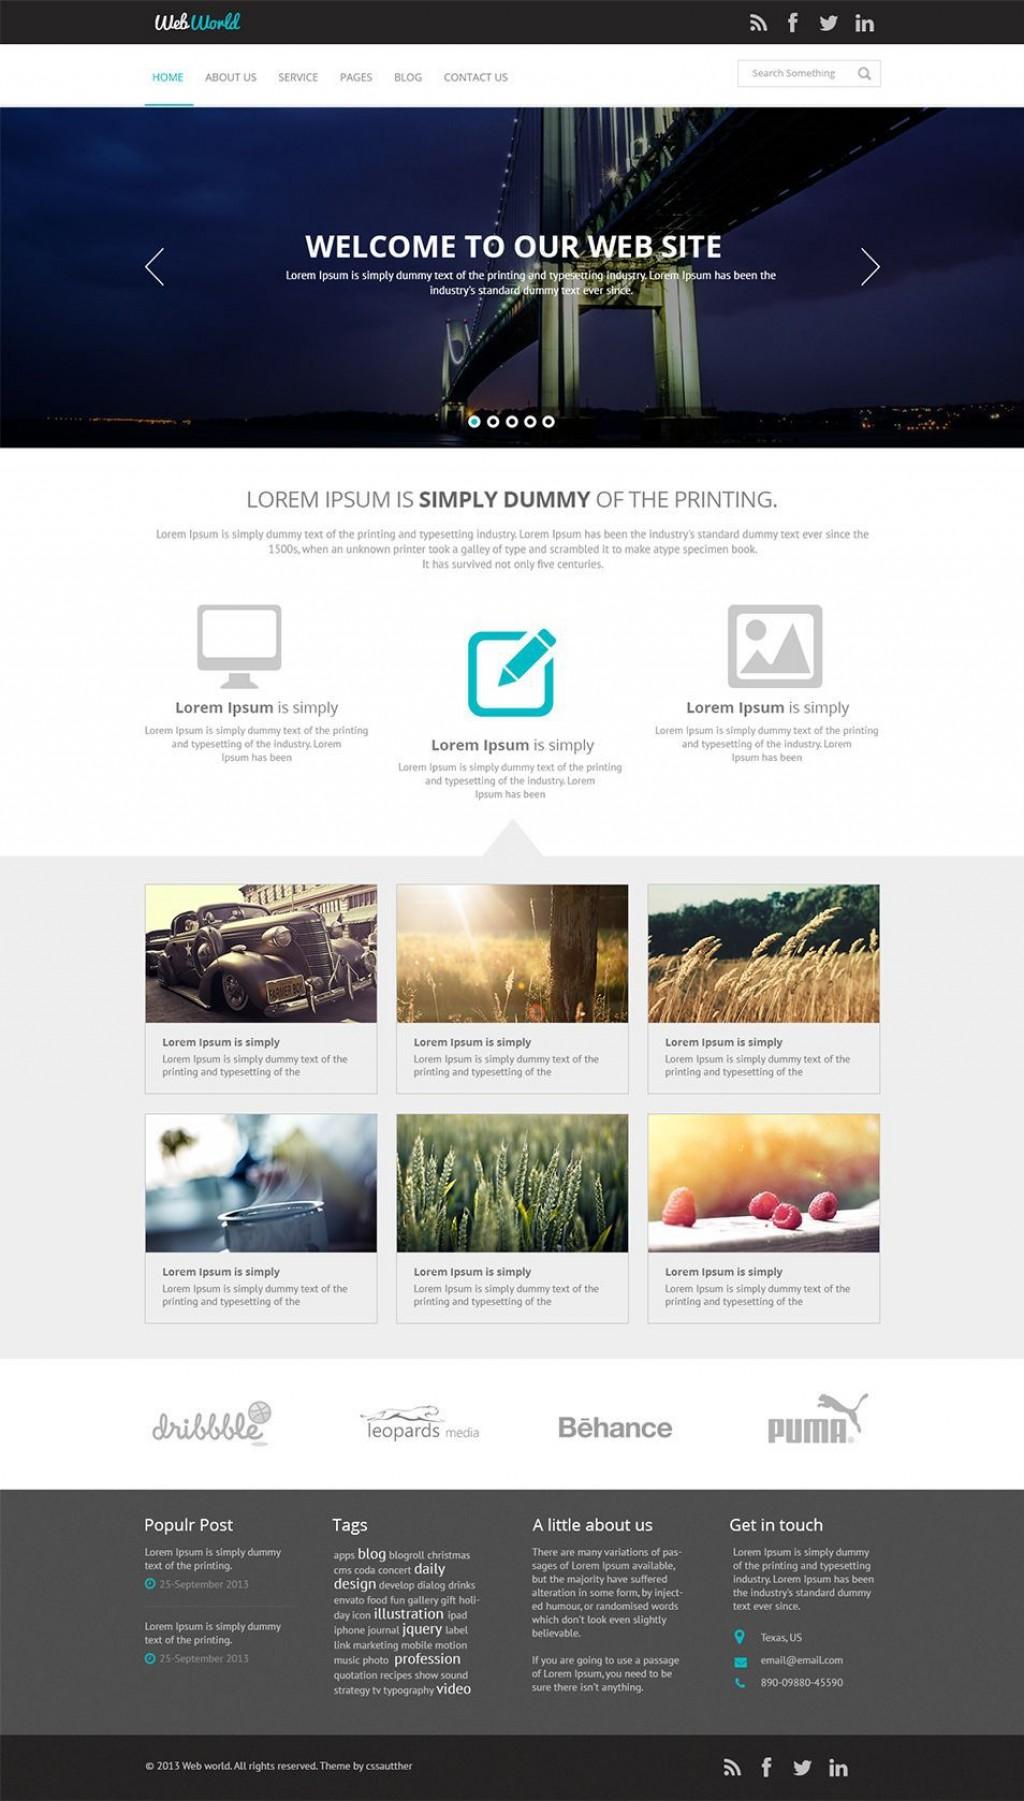 001 Unforgettable Free Professional Web Design Template Sample  Templates Website DownloadLarge